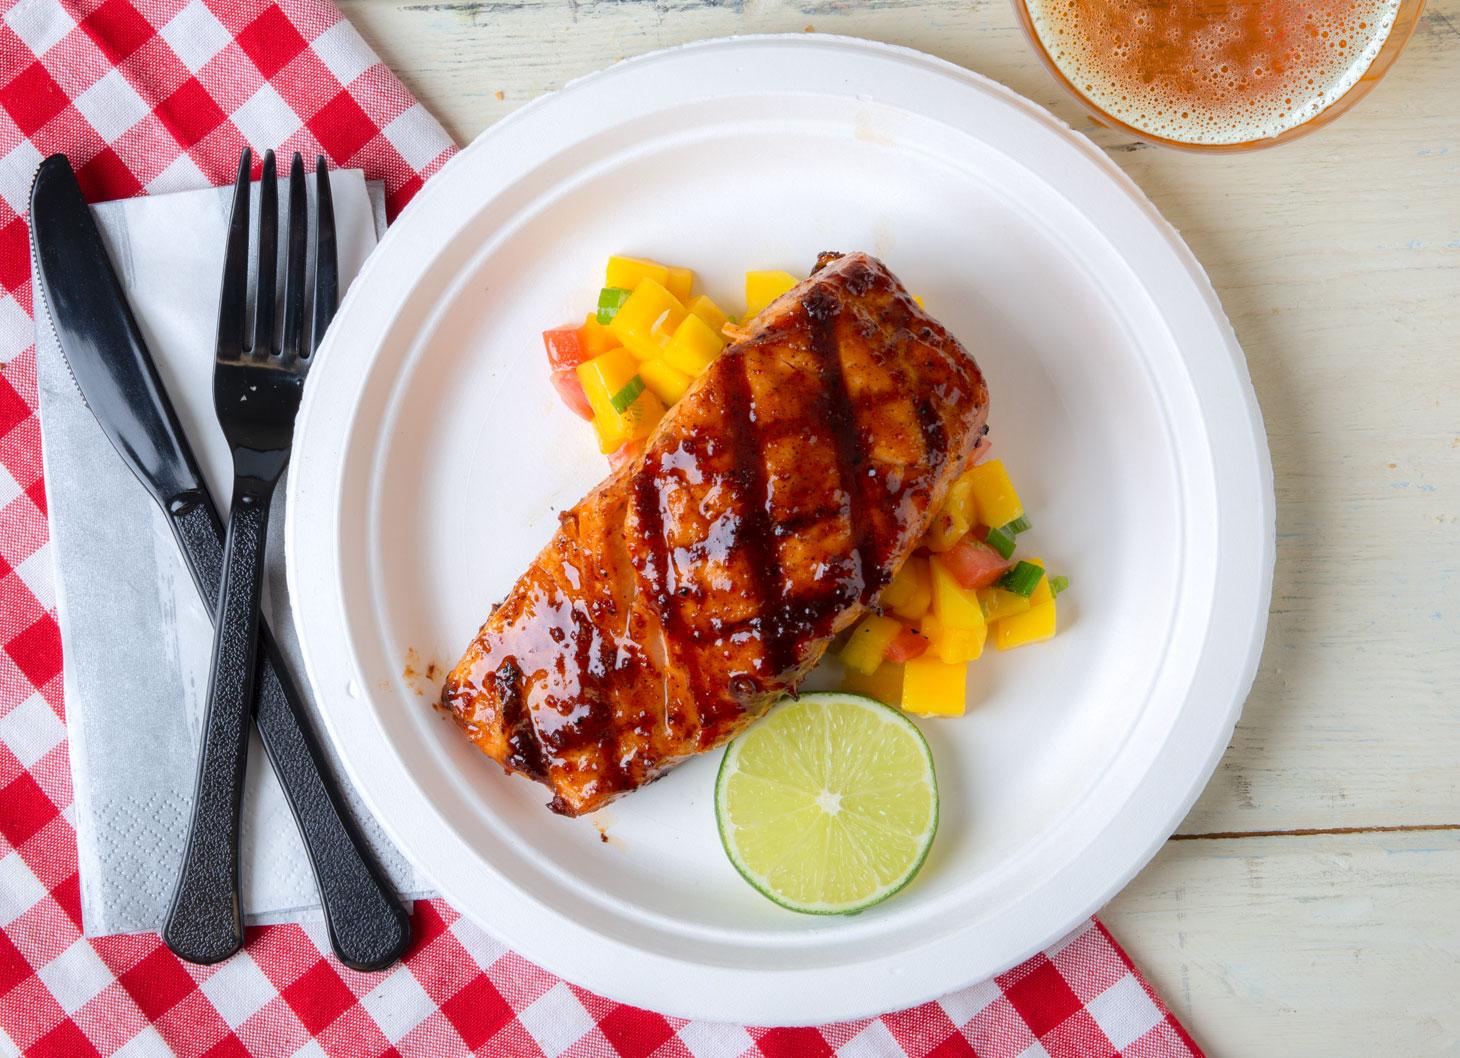 h624-grilled-salmon-with-gochujang-bbq-sauce.jpg